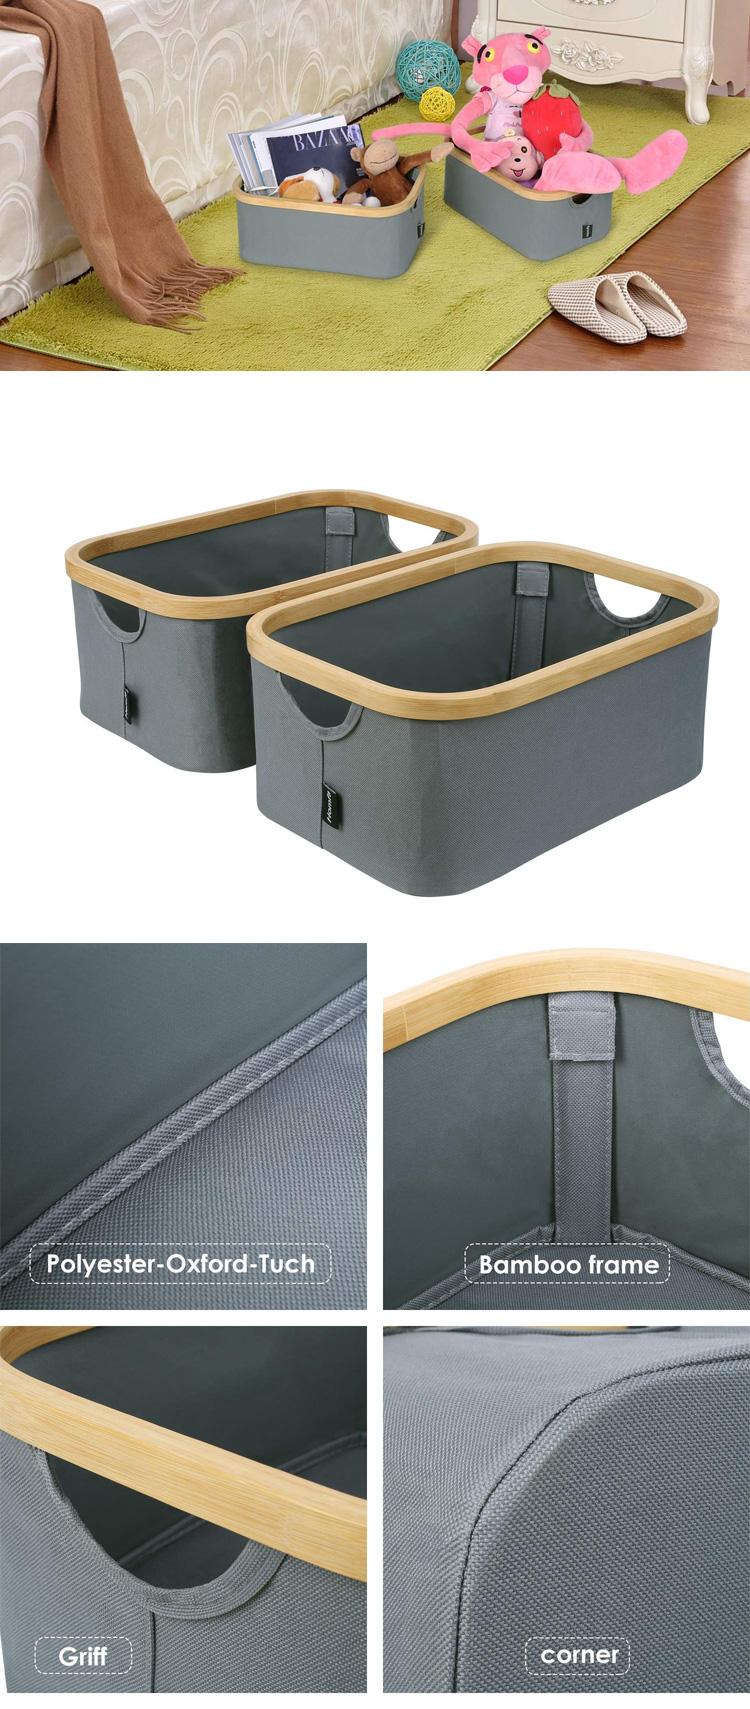 Rectangle Foldable Bamboo Cloth Storage Basket Large Collapsible Laundry Basket Organizer